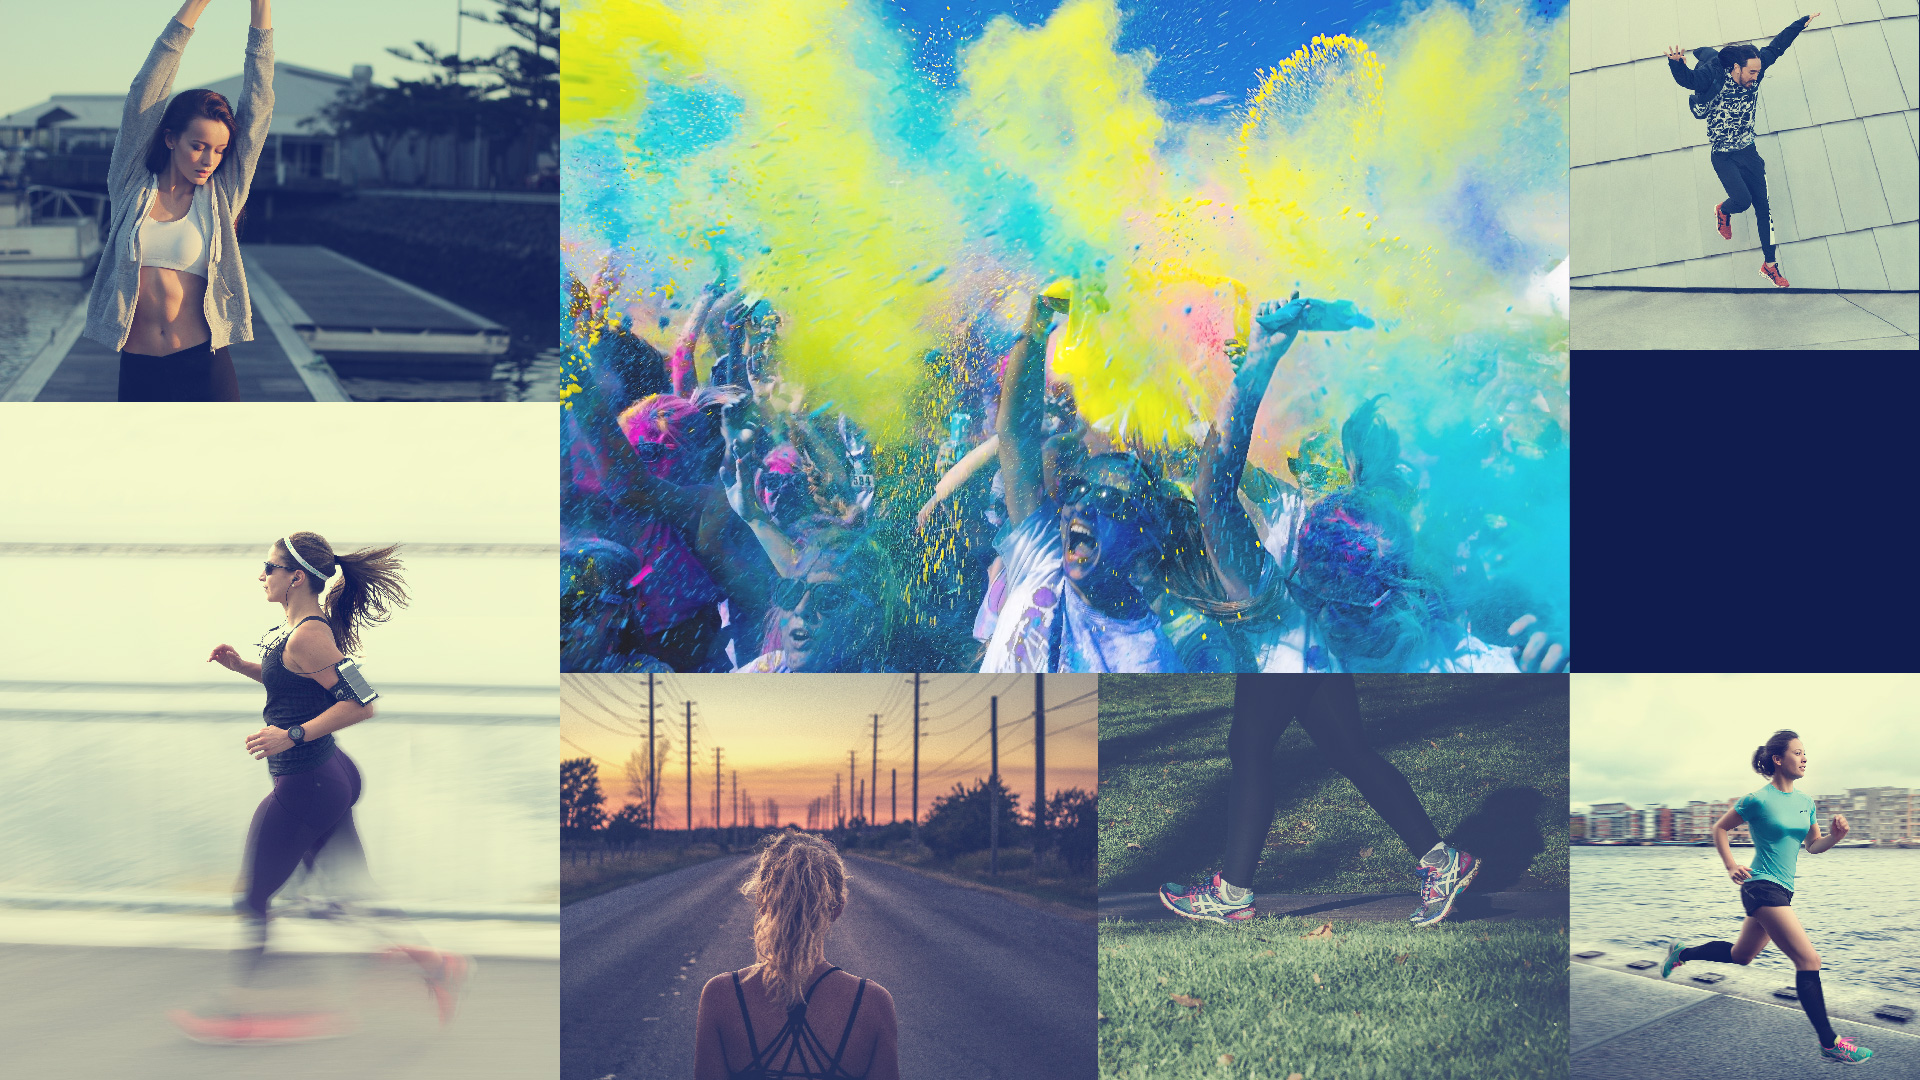 moodboard_fotos.jpg